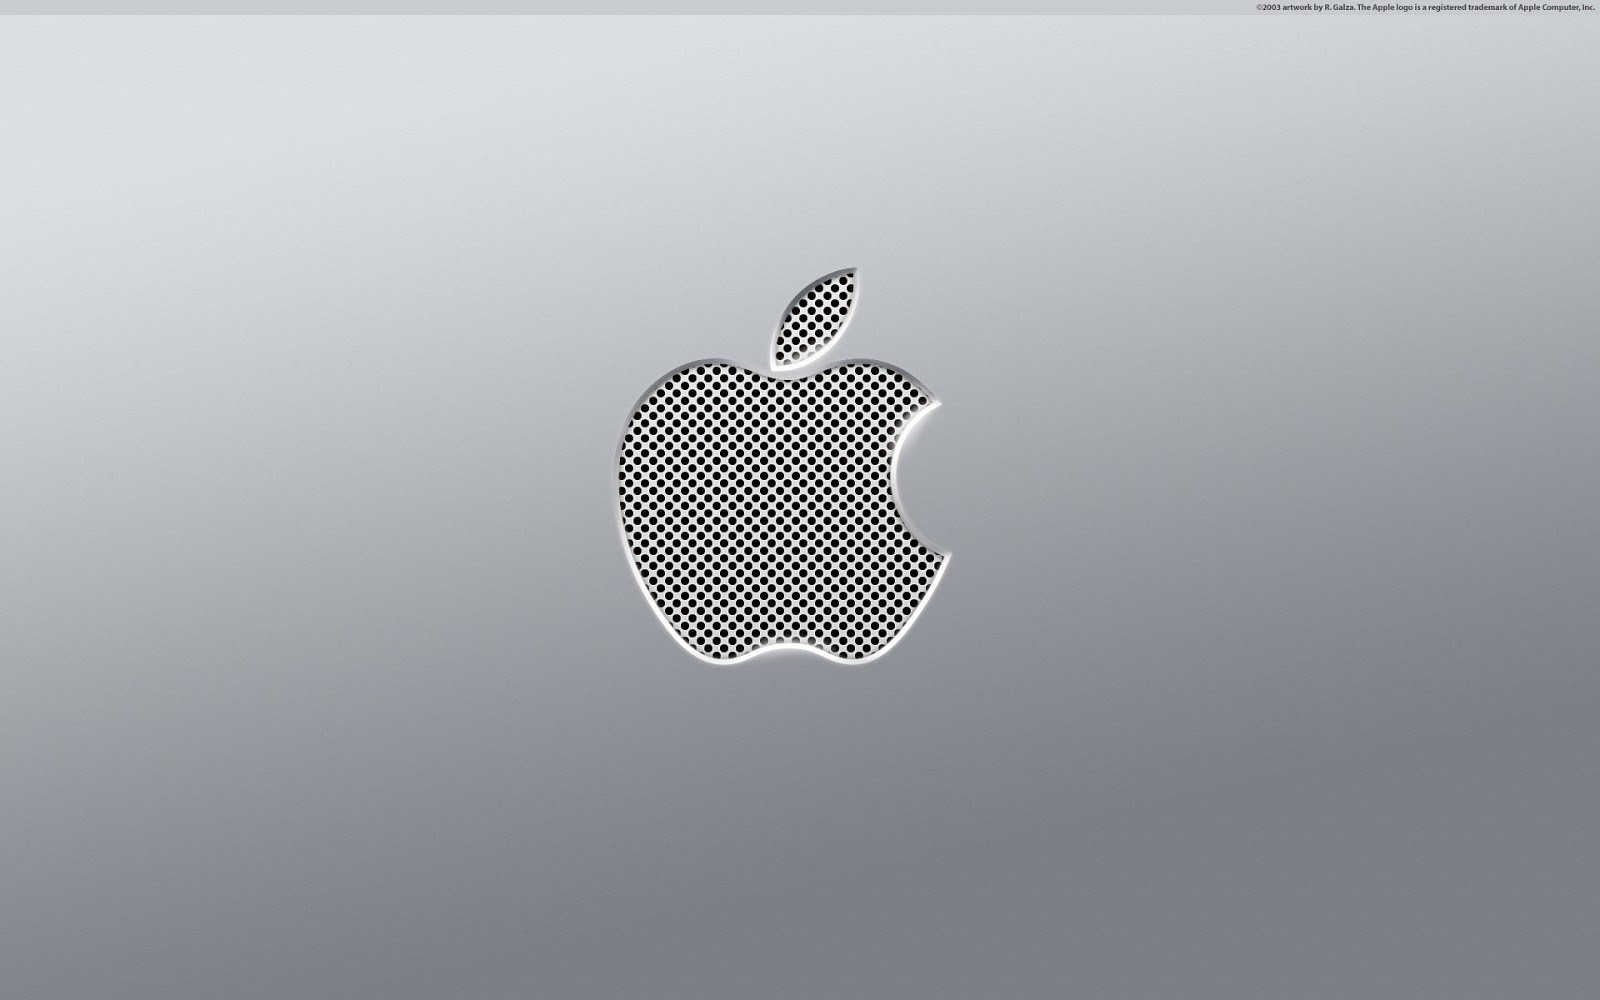 Hd Wallpapers 1080p Mac 65 Images: Hd Mac Wallpapers 1080p